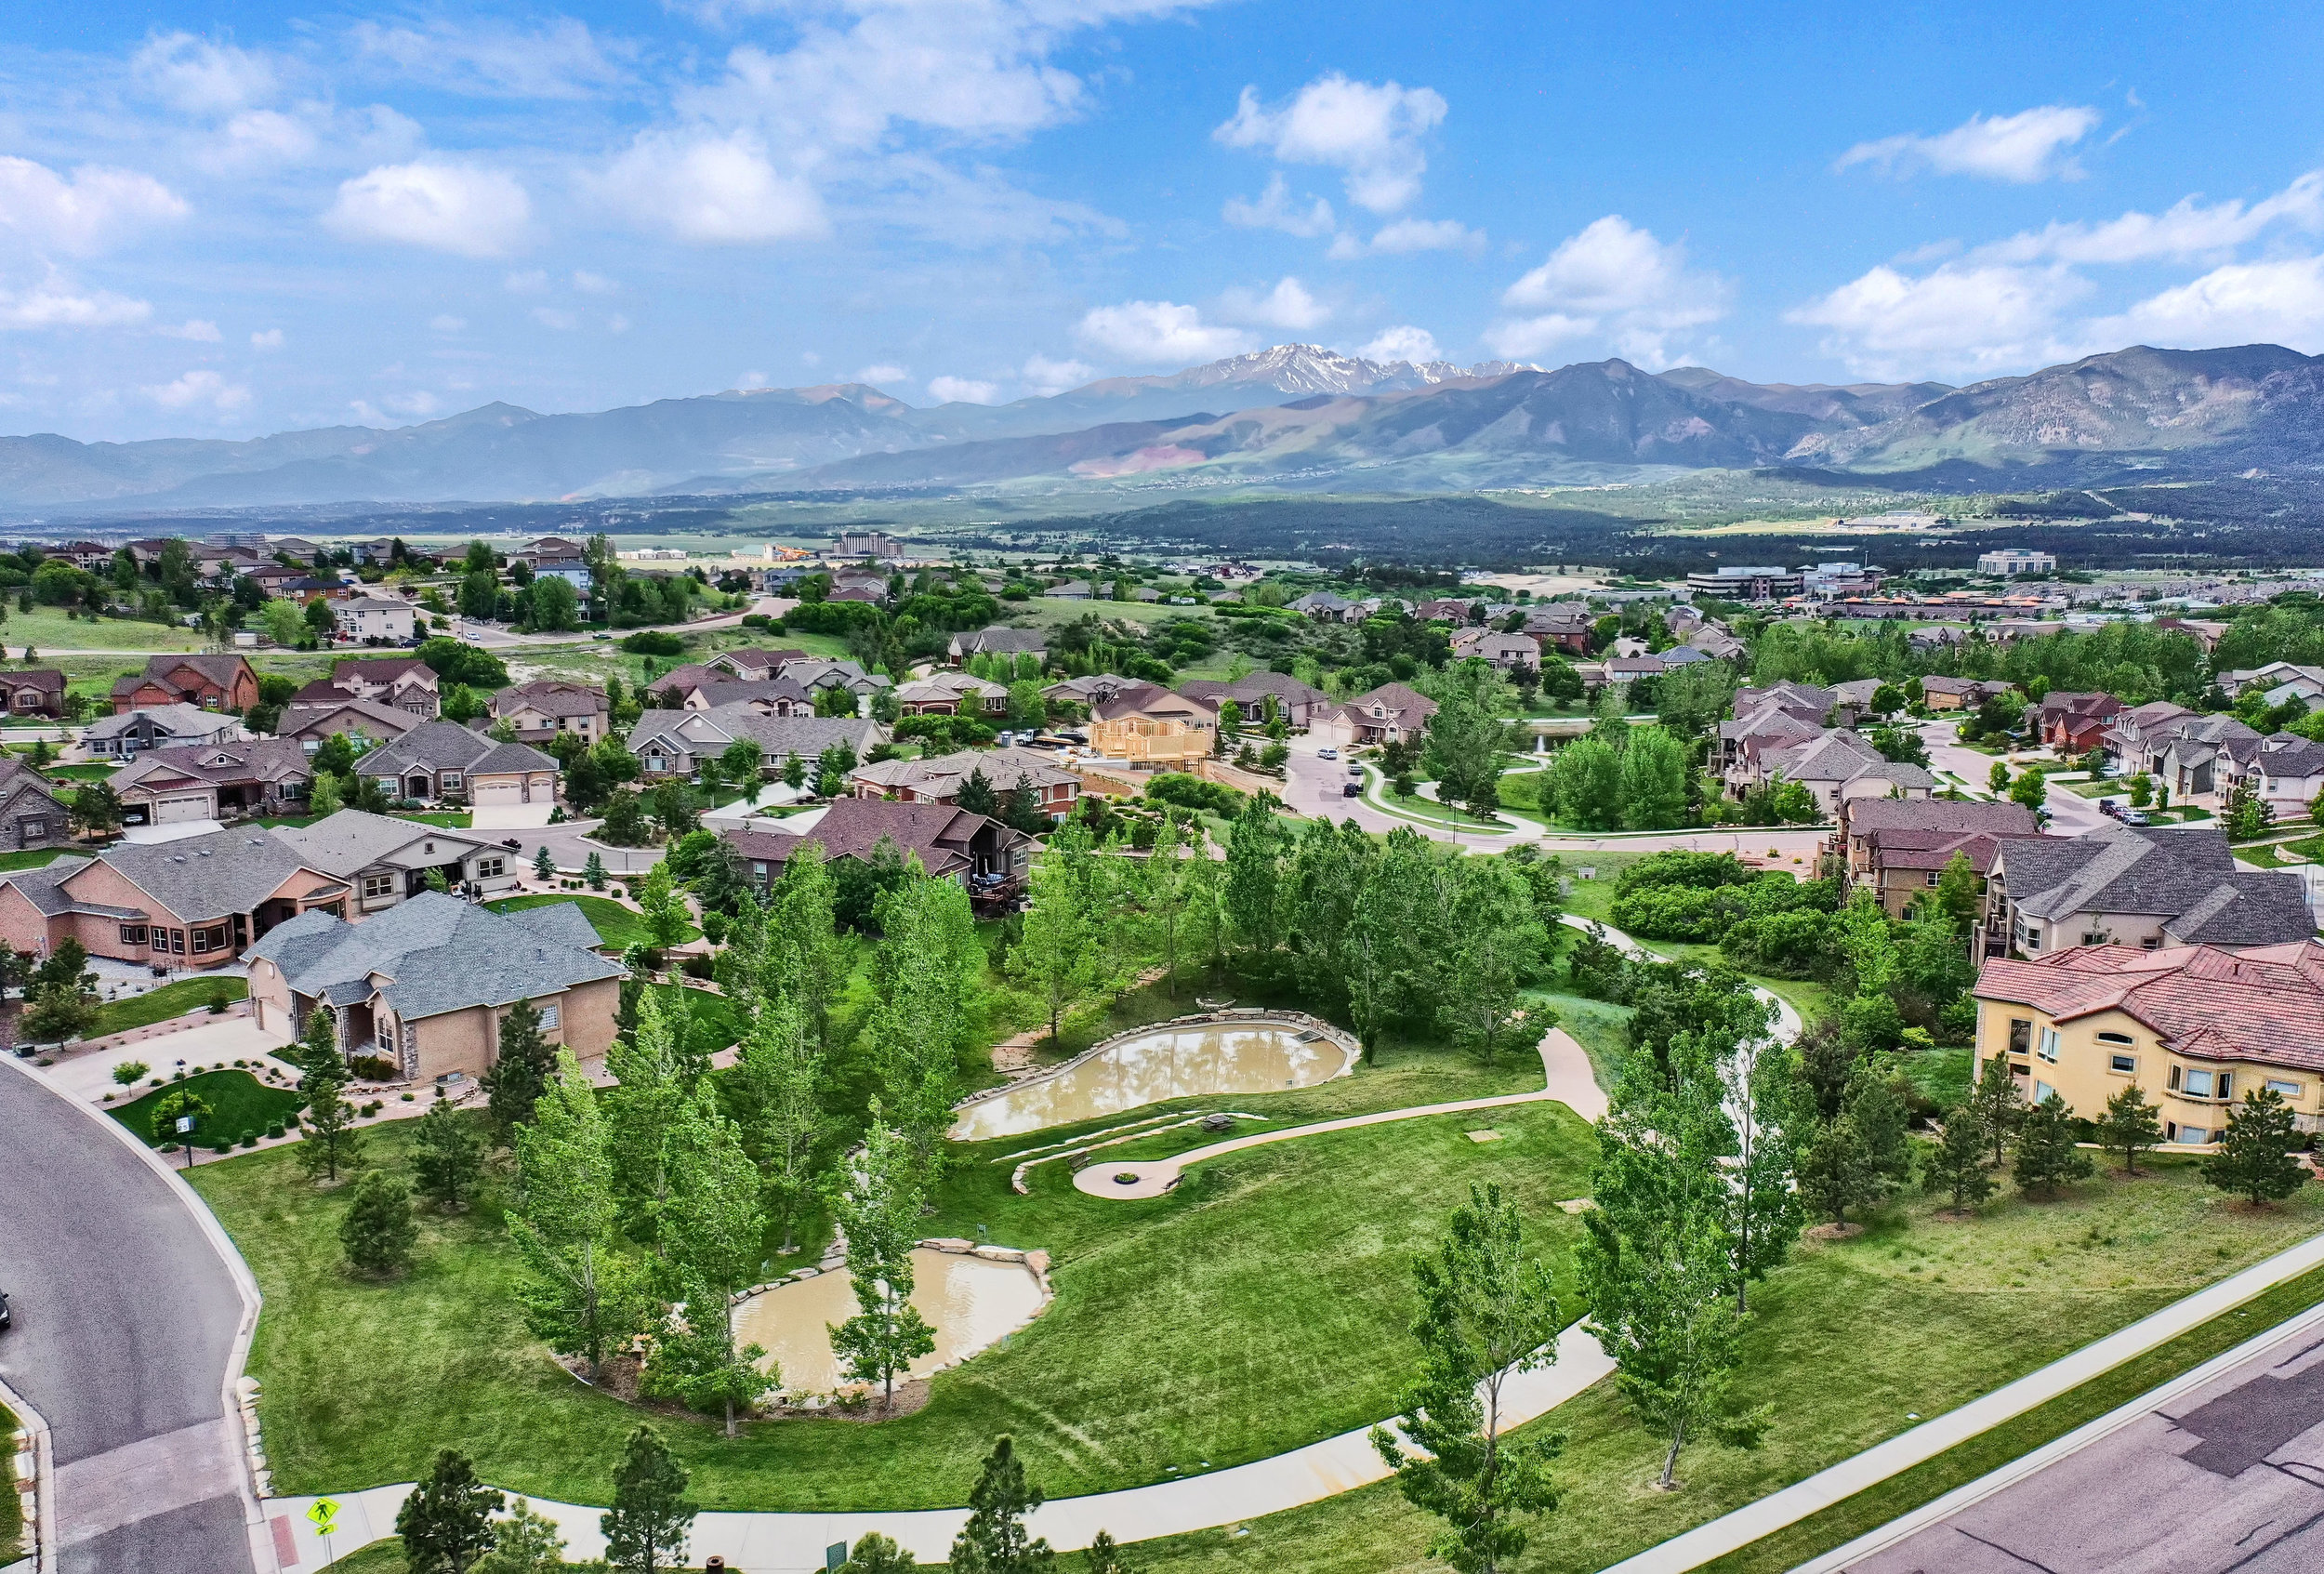 12496 Creekhurst Dr Colorado-print-018-058-Aerial-4200x2844-300dpi.jpg